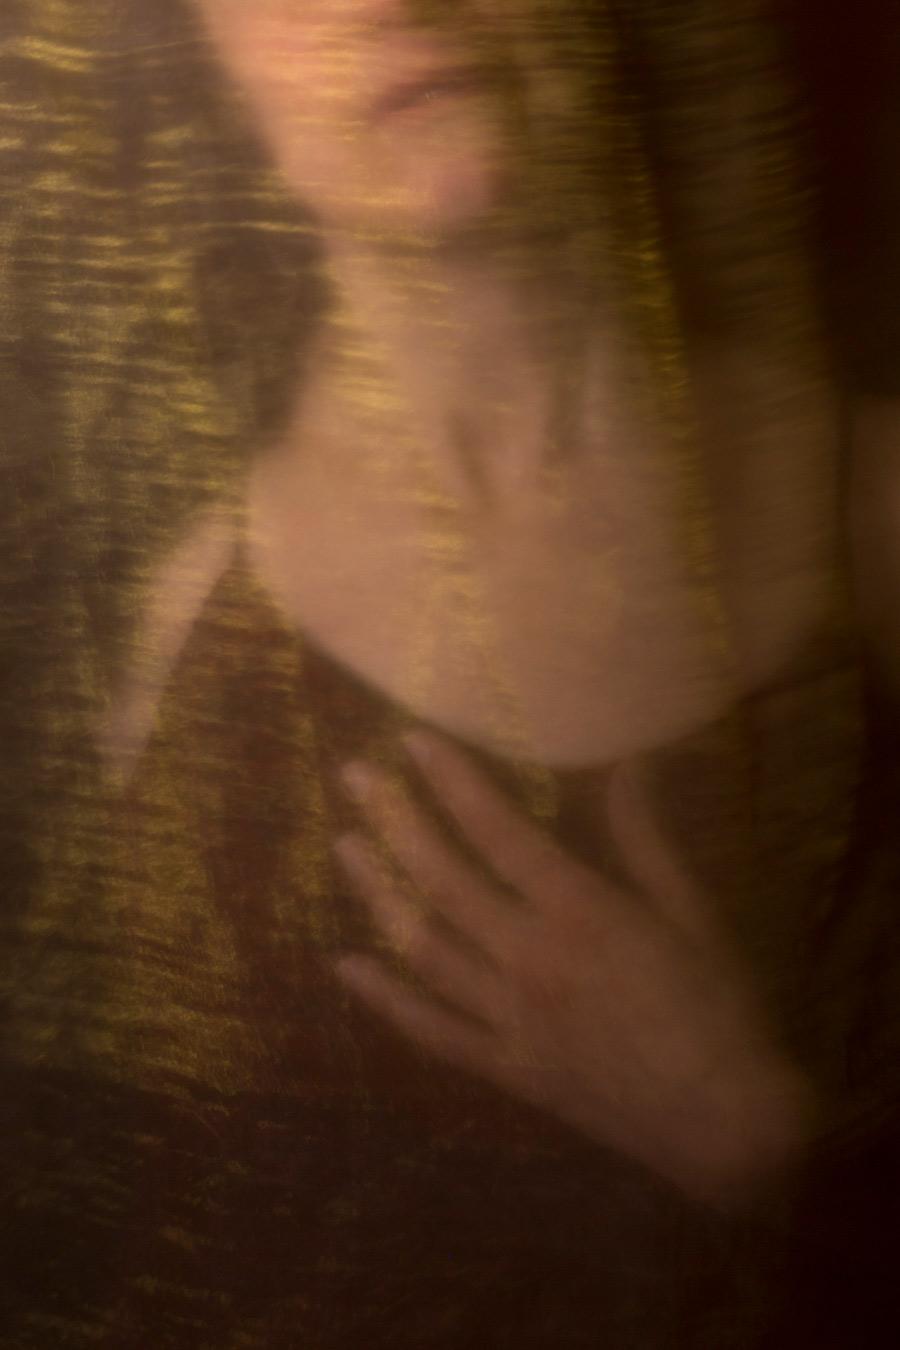 Il-dono-piu-bello-Fenice-ritratti-light-painting-allebonicalzi-3